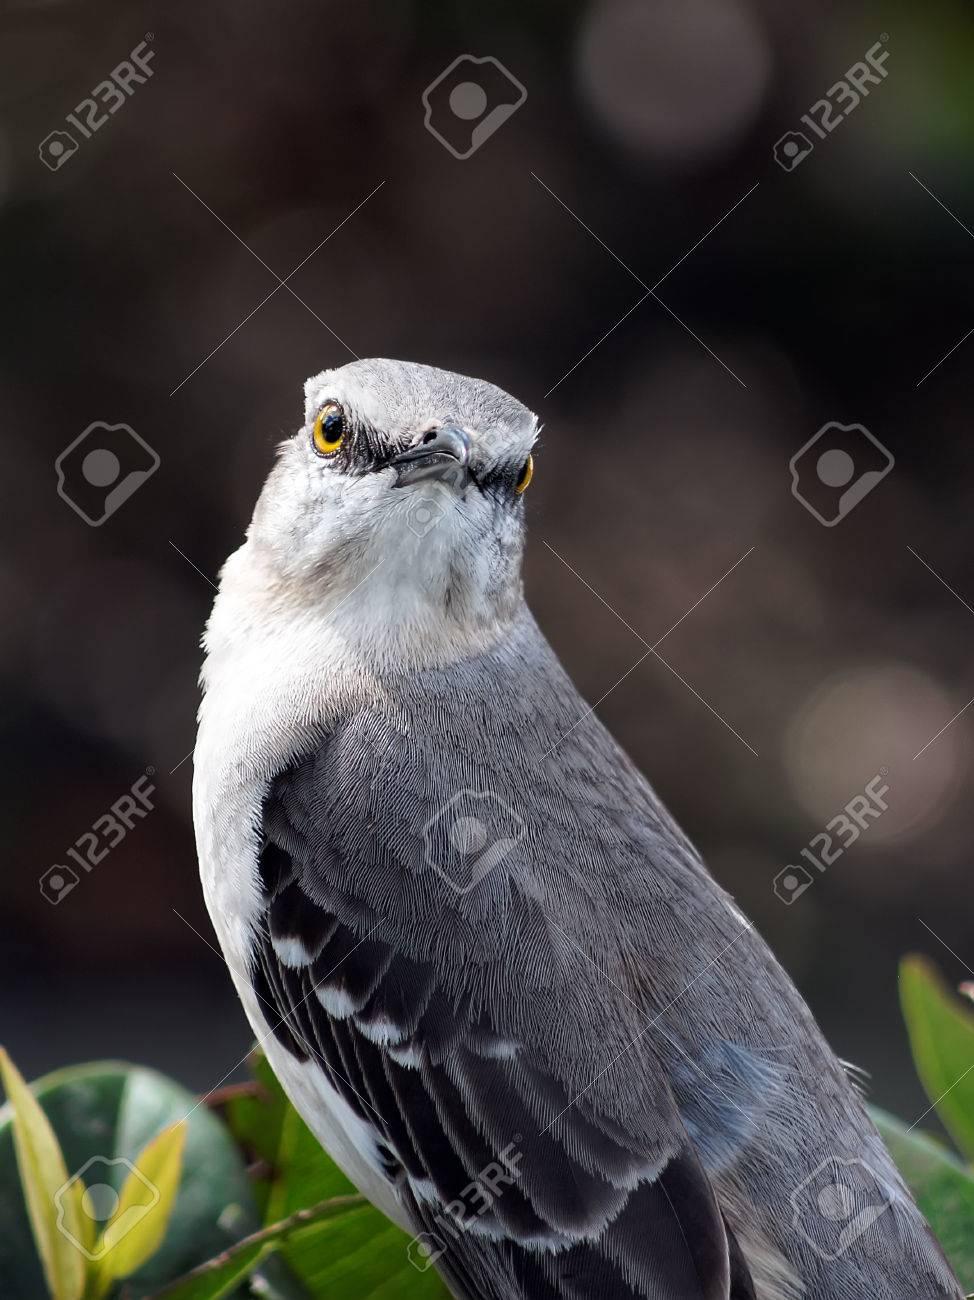 Florida State Bird - Looking At Me